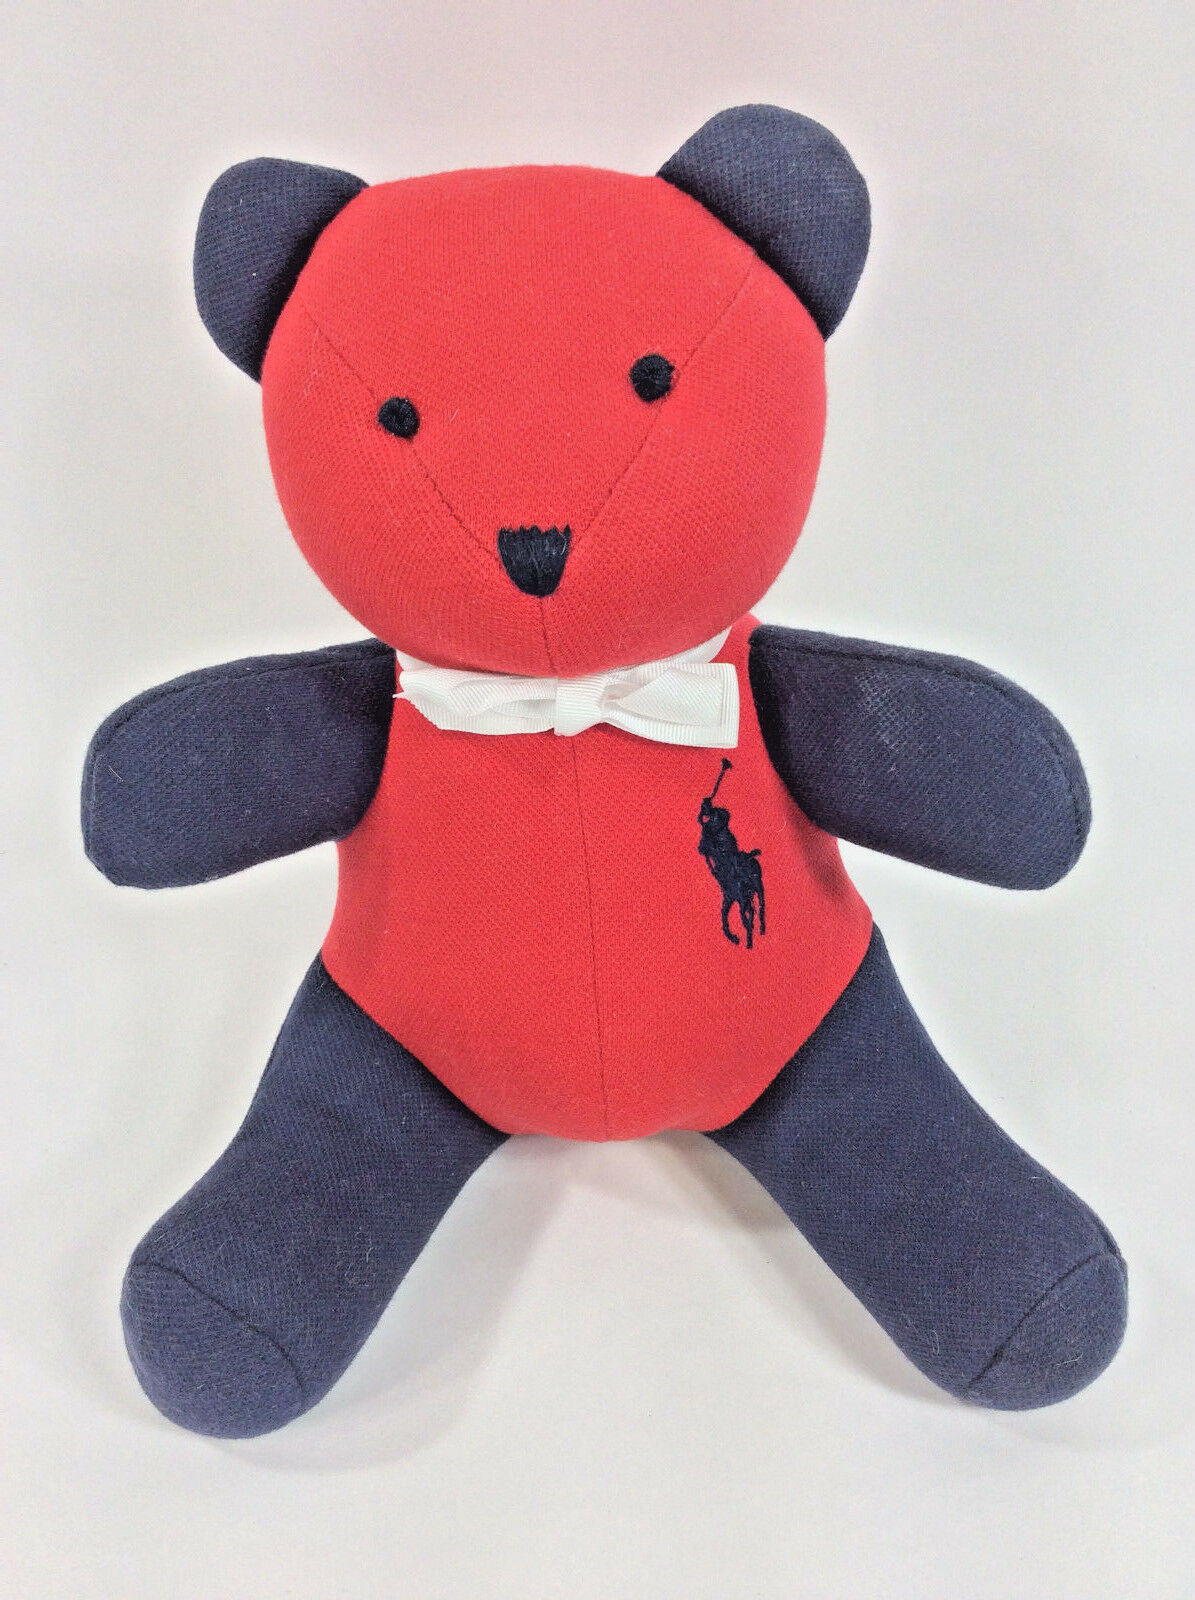 Ralph Lauren Teddy Bear Red White bluee Polo Plush Stuffed Animal 12